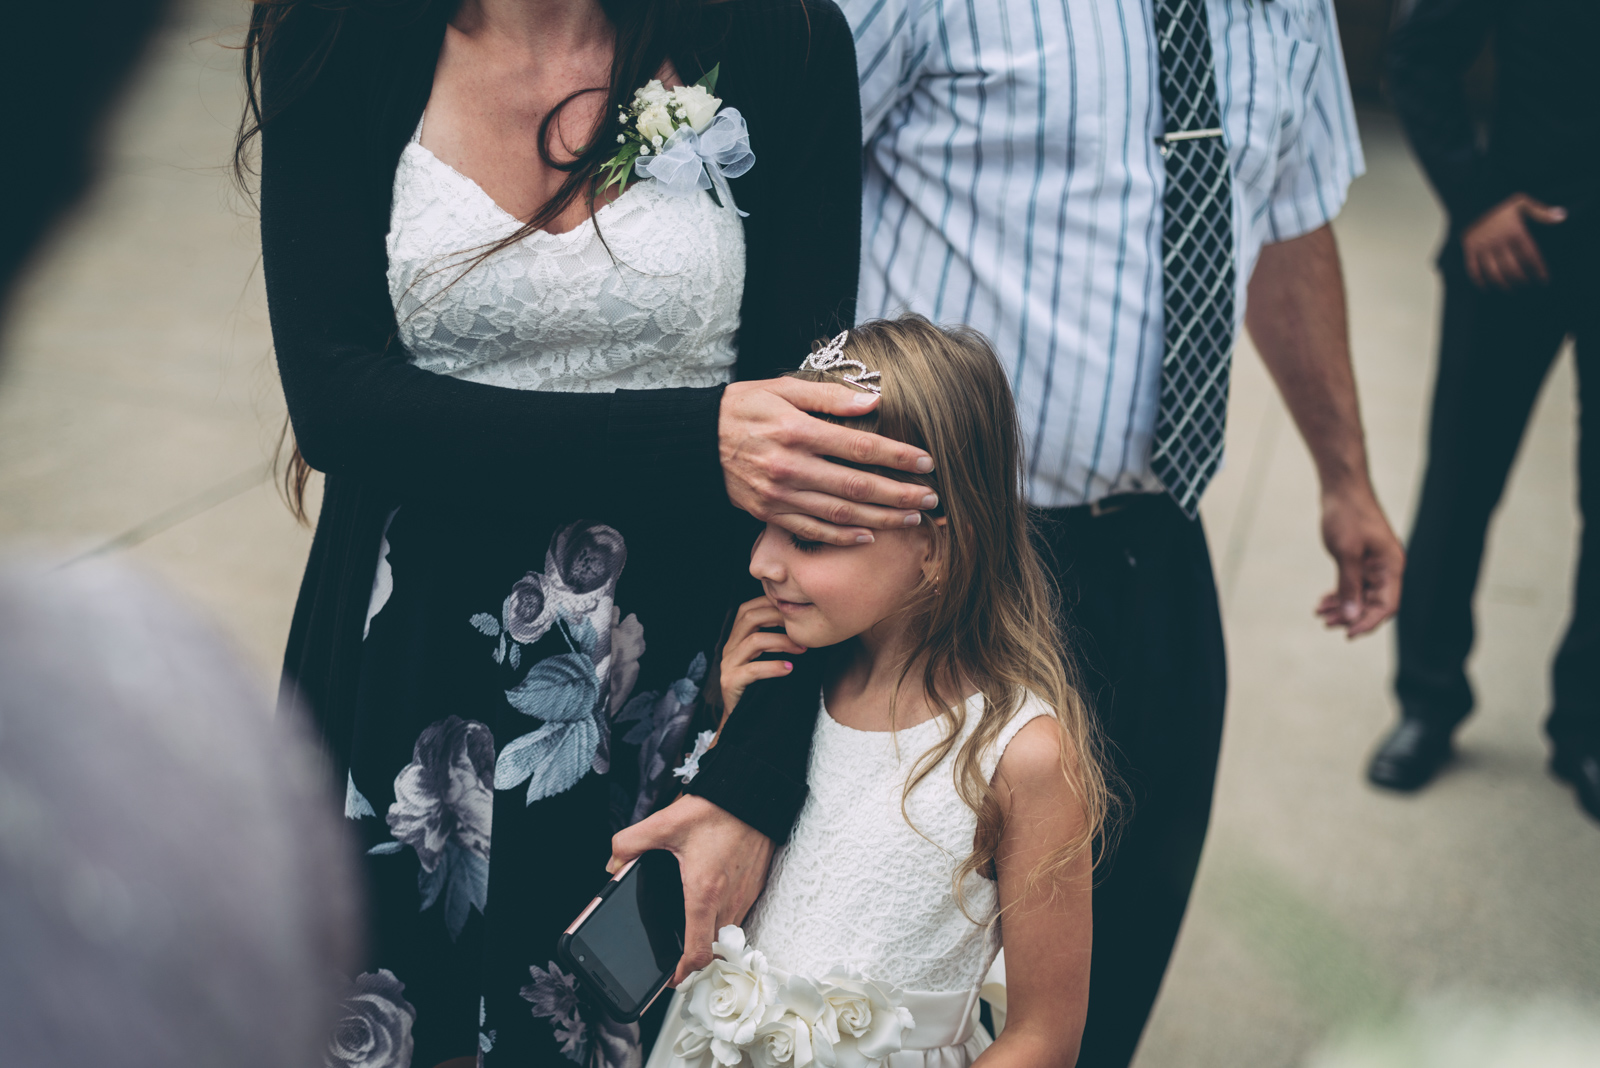 top-wedding-photos-2018-blog-64.jpg